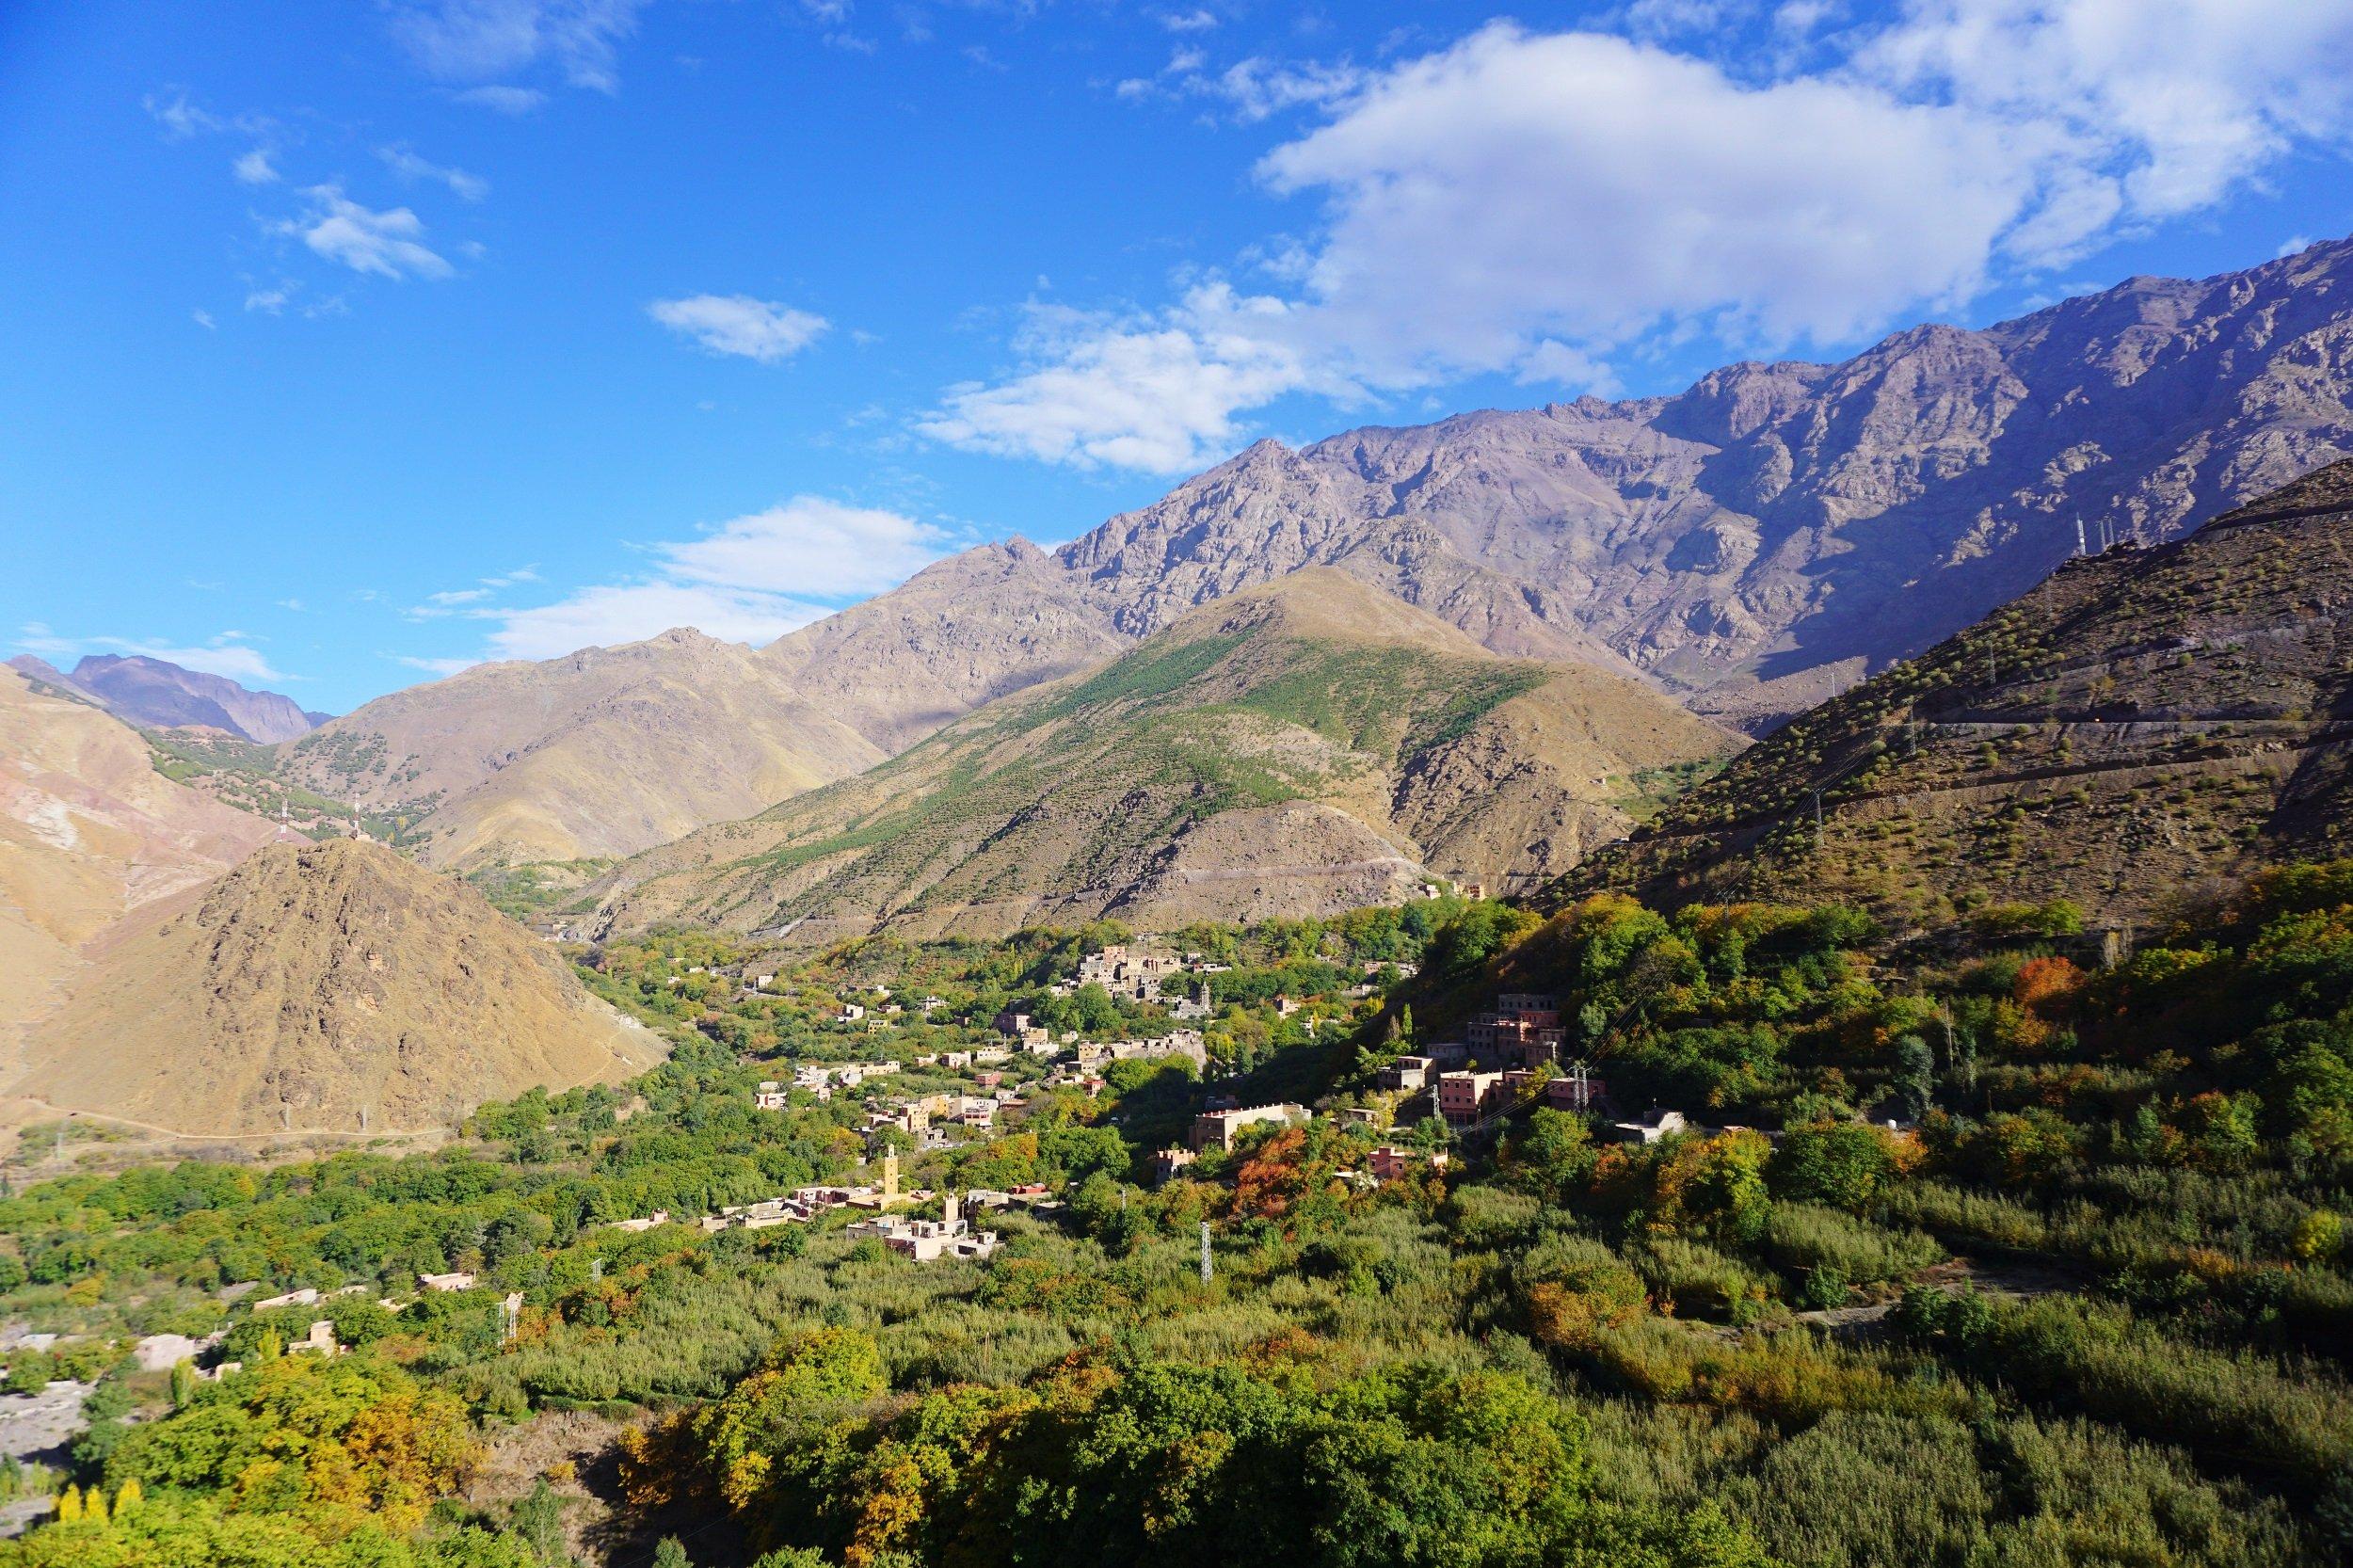 Imlil & Aroumd Berber Village Tour From Marrakesh_3